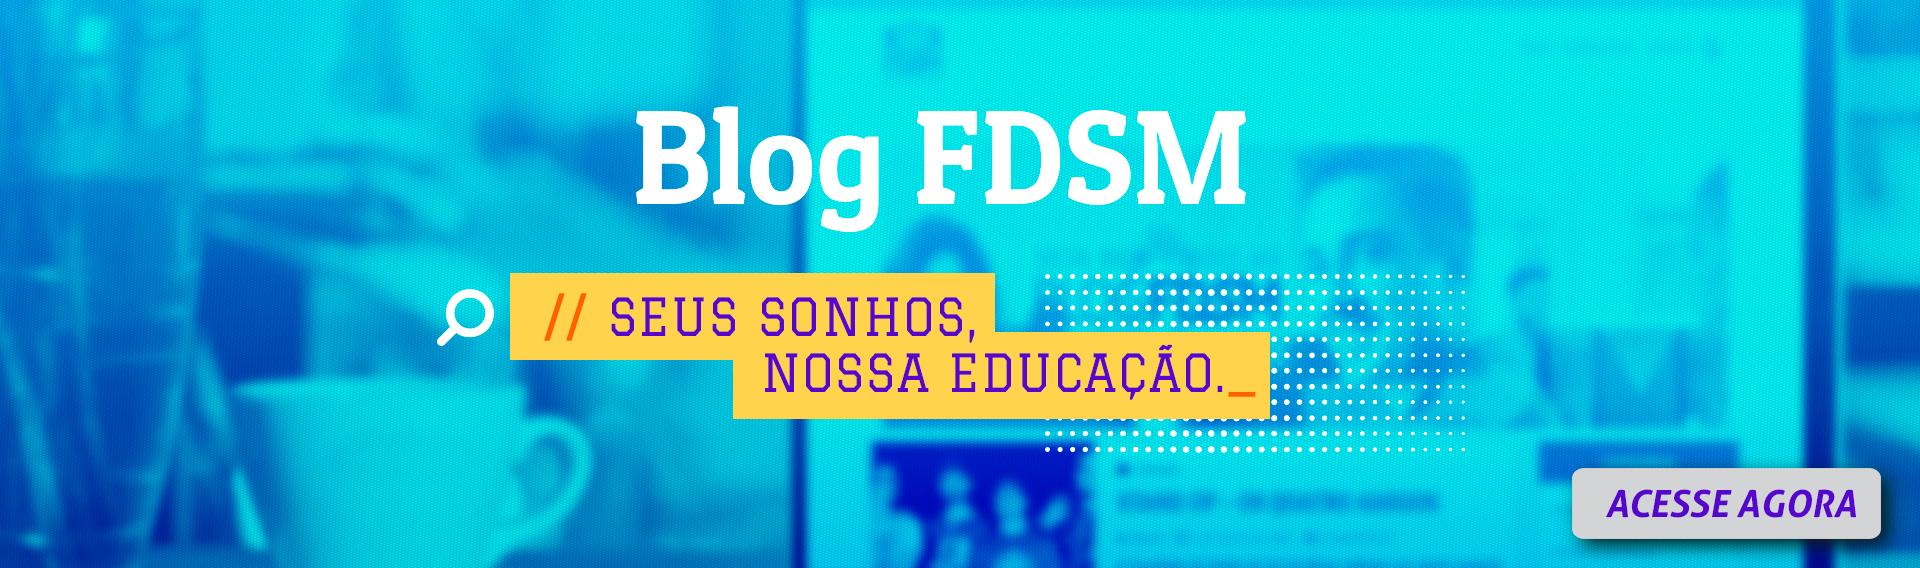 Blog FDSM